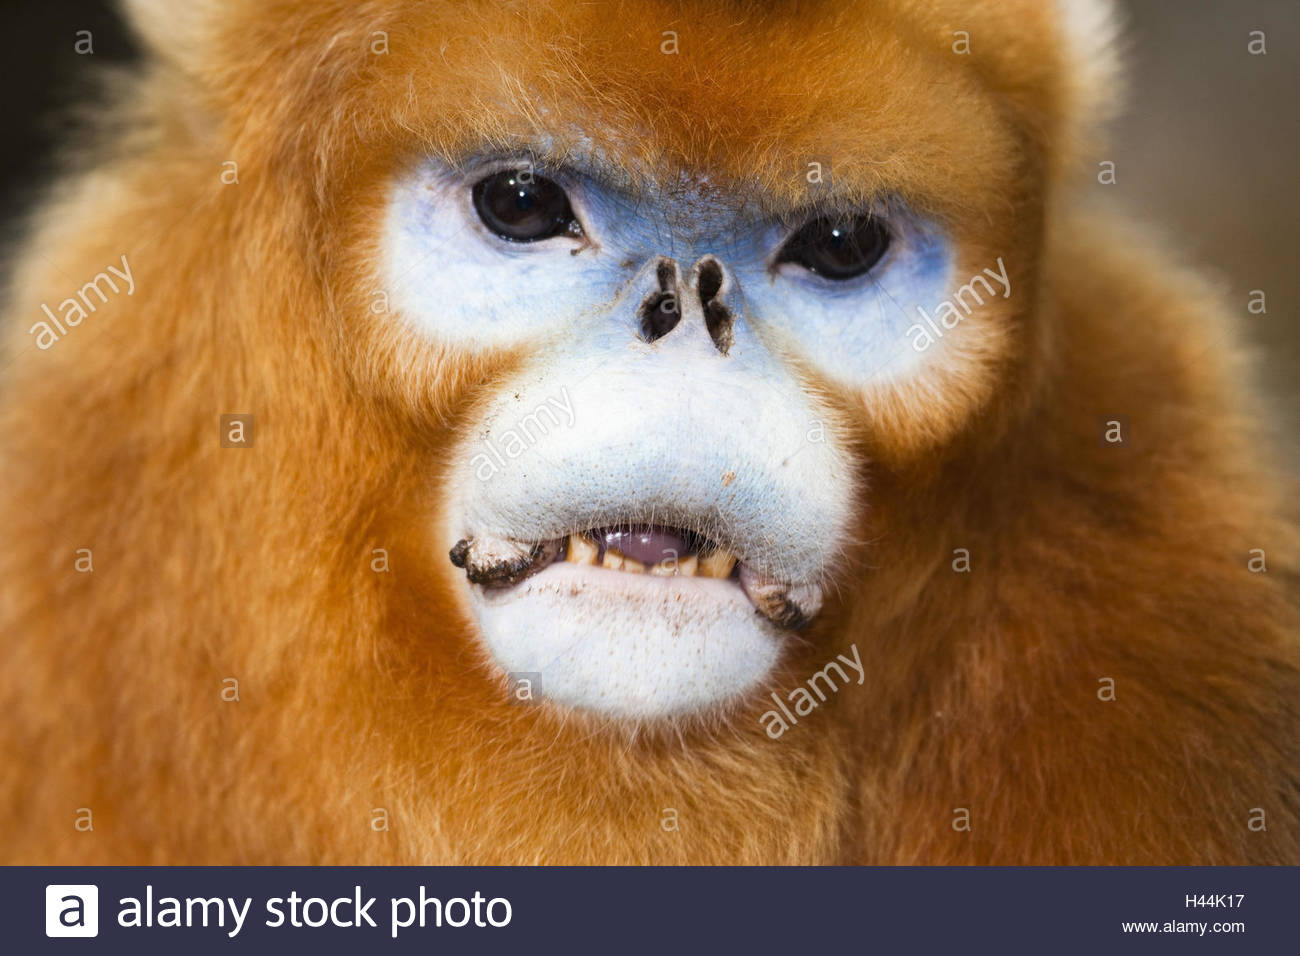 Monkeys, golden stump noses, Rhinopithecus roxellana, little men, portrait, - Stock Image